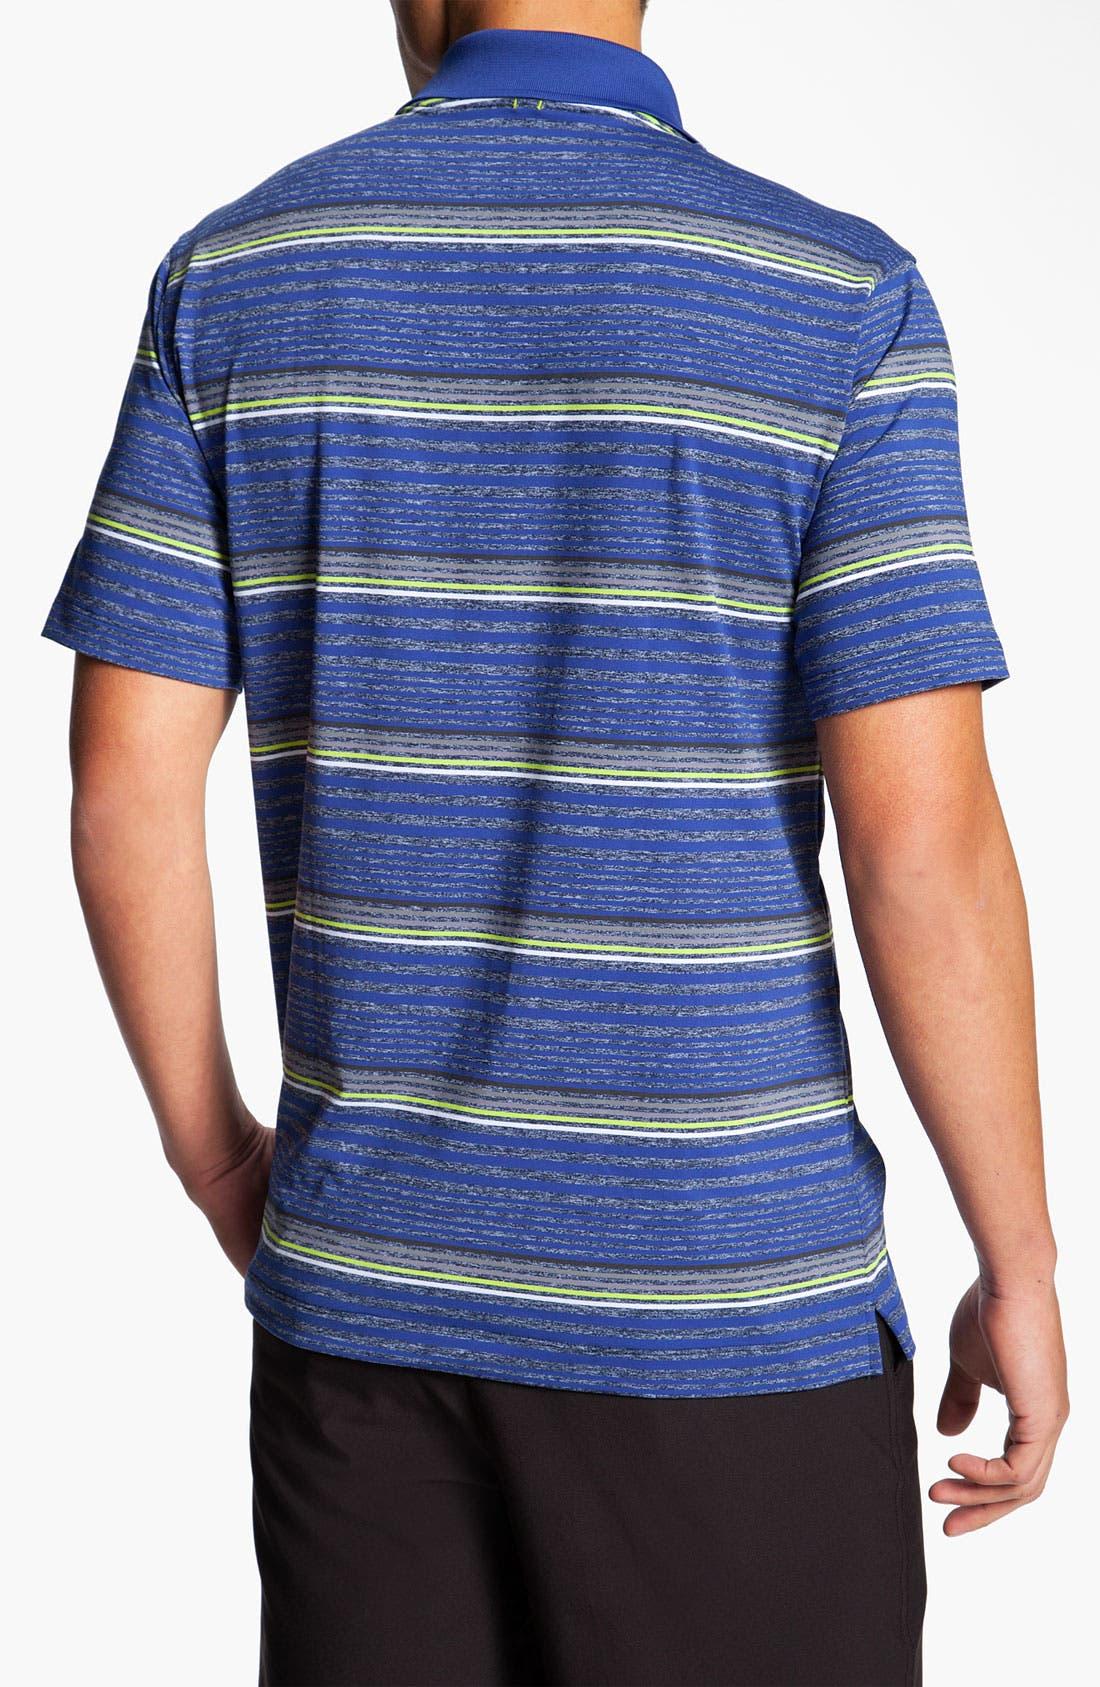 Alternate Image 2  - Nike Golf 'Fashion Stripe' Dri-FIT Polo